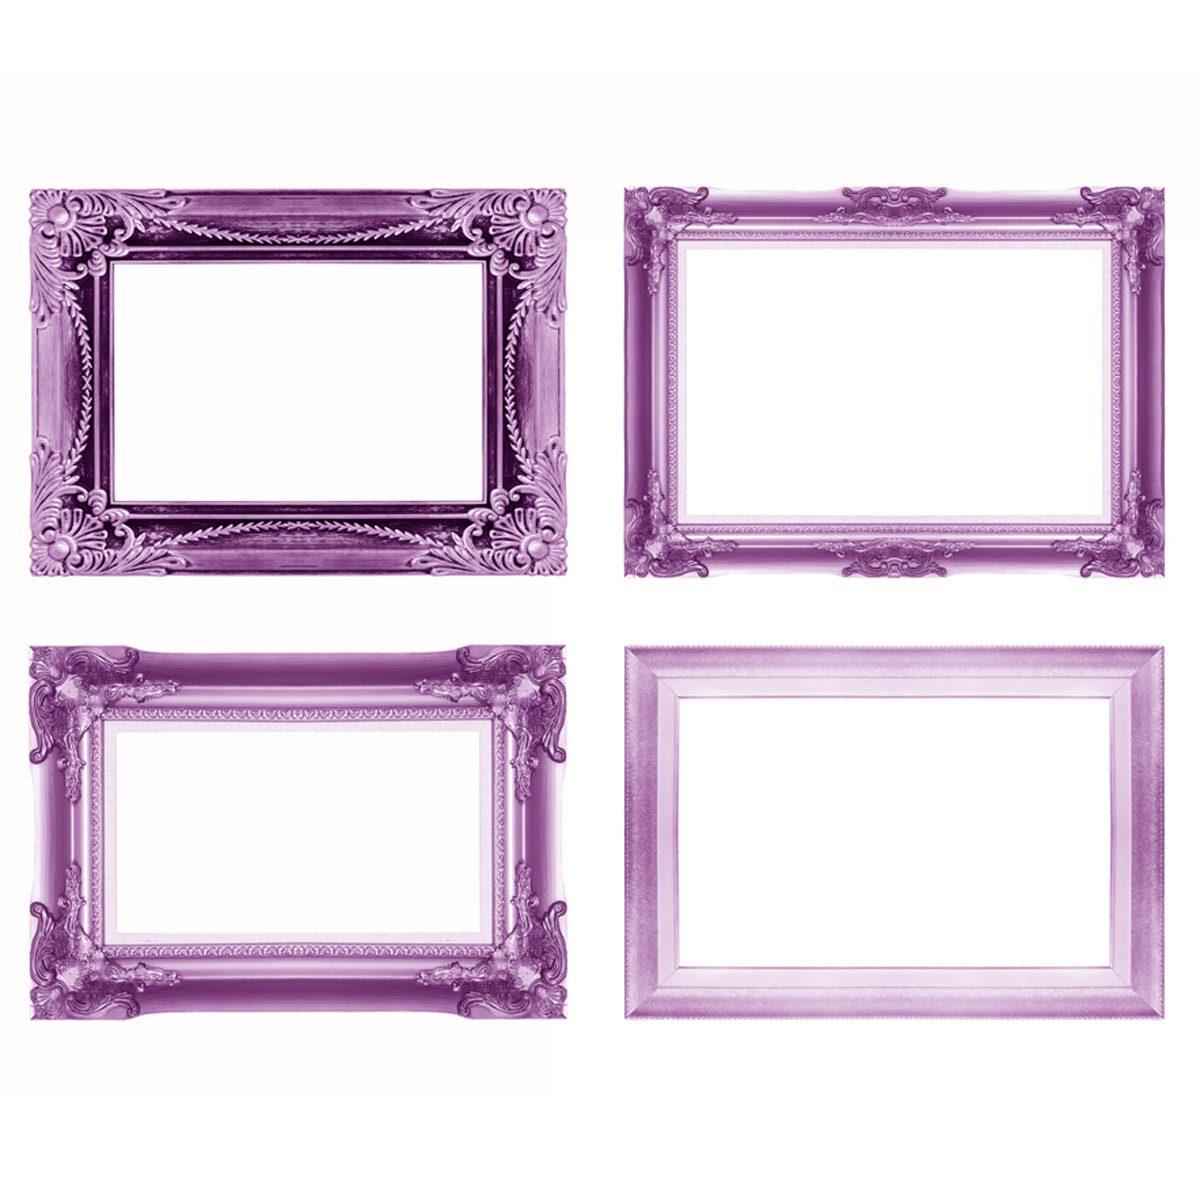 shutterstock_155198090 purple violet picture frames